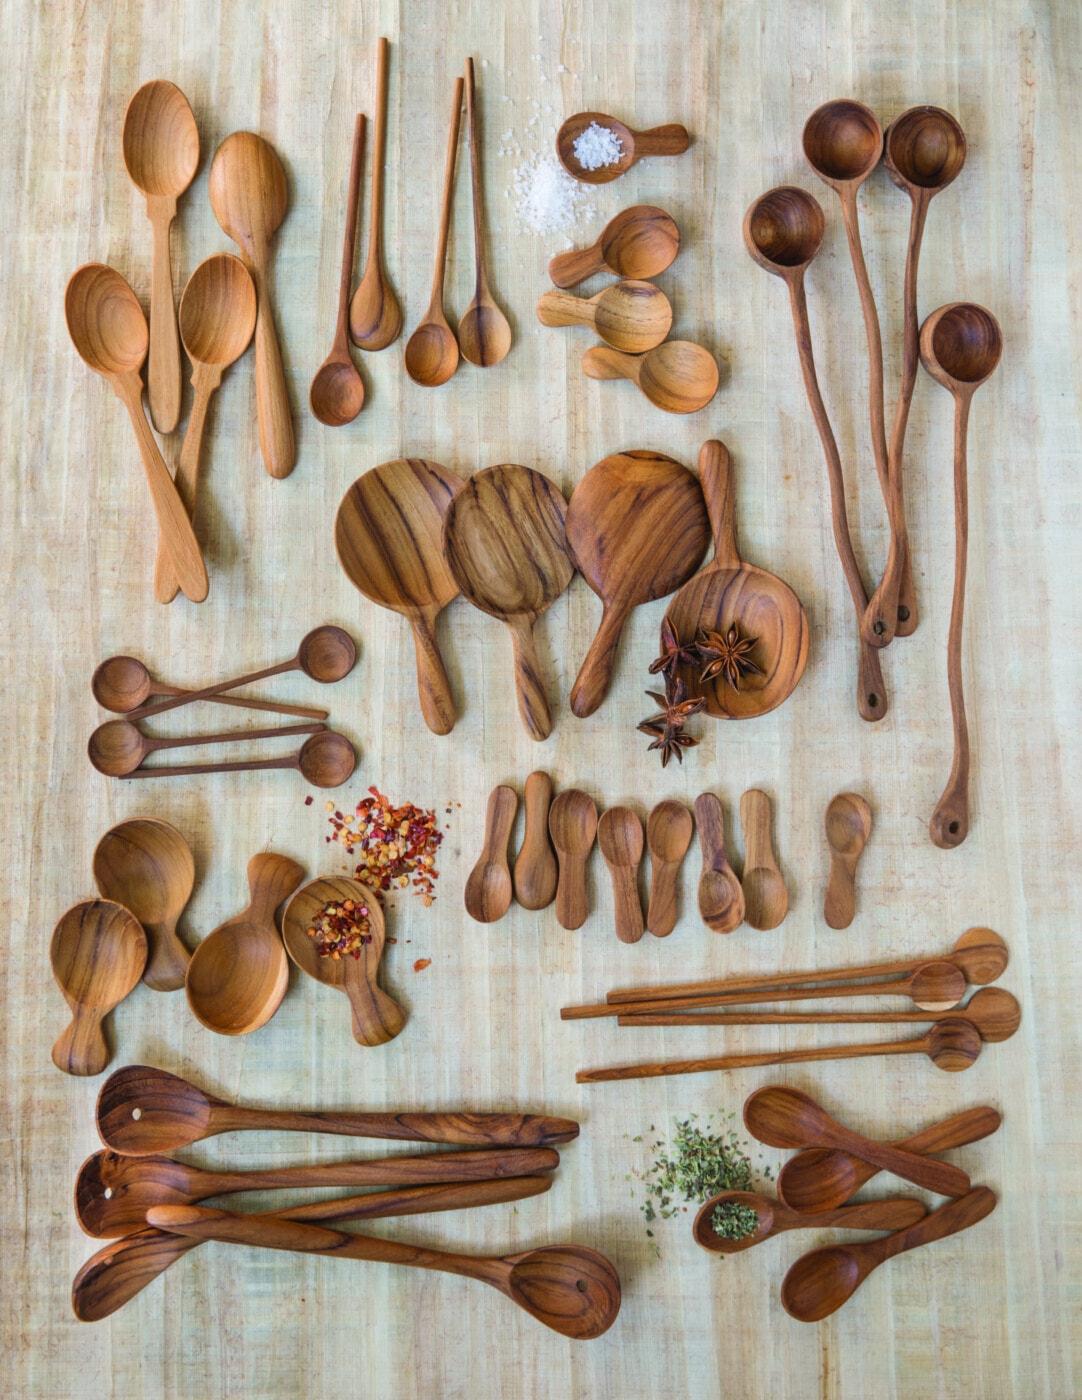 Teak Round Spoons, Small Set of 4 2